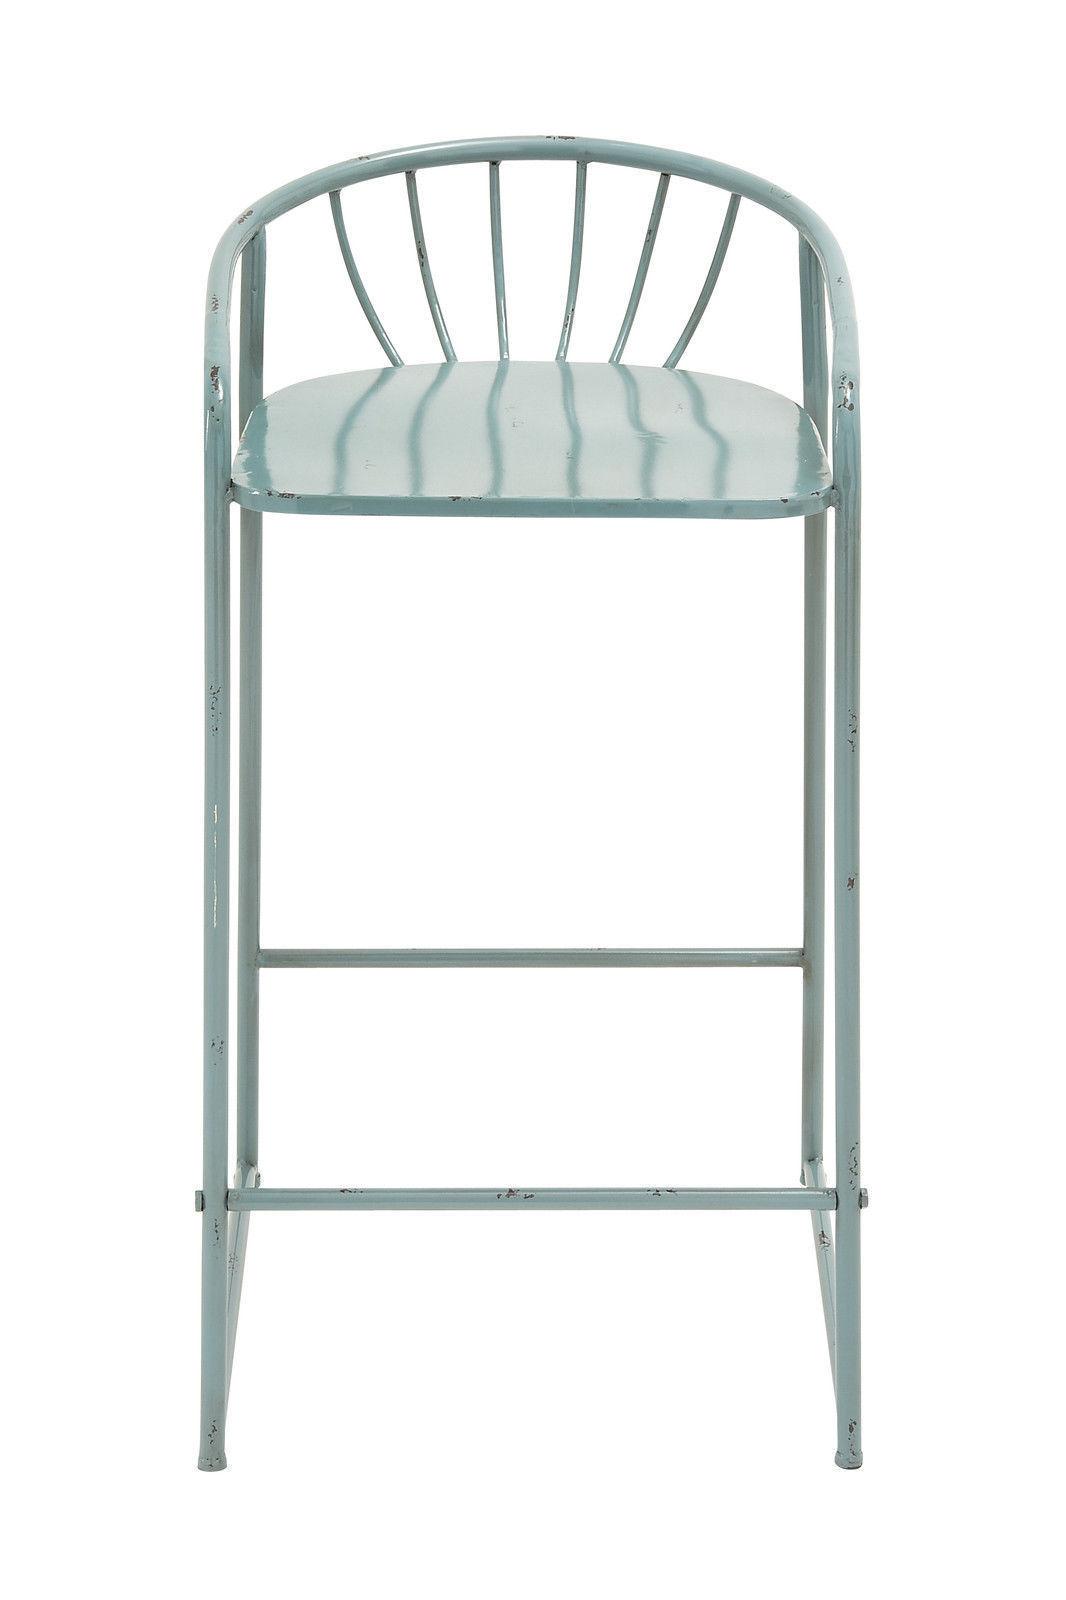 Cool Benzara 2 Most Comfortable Metal Bar Stools And 50 Similar Items Camellatalisay Diy Chair Ideas Camellatalisaycom